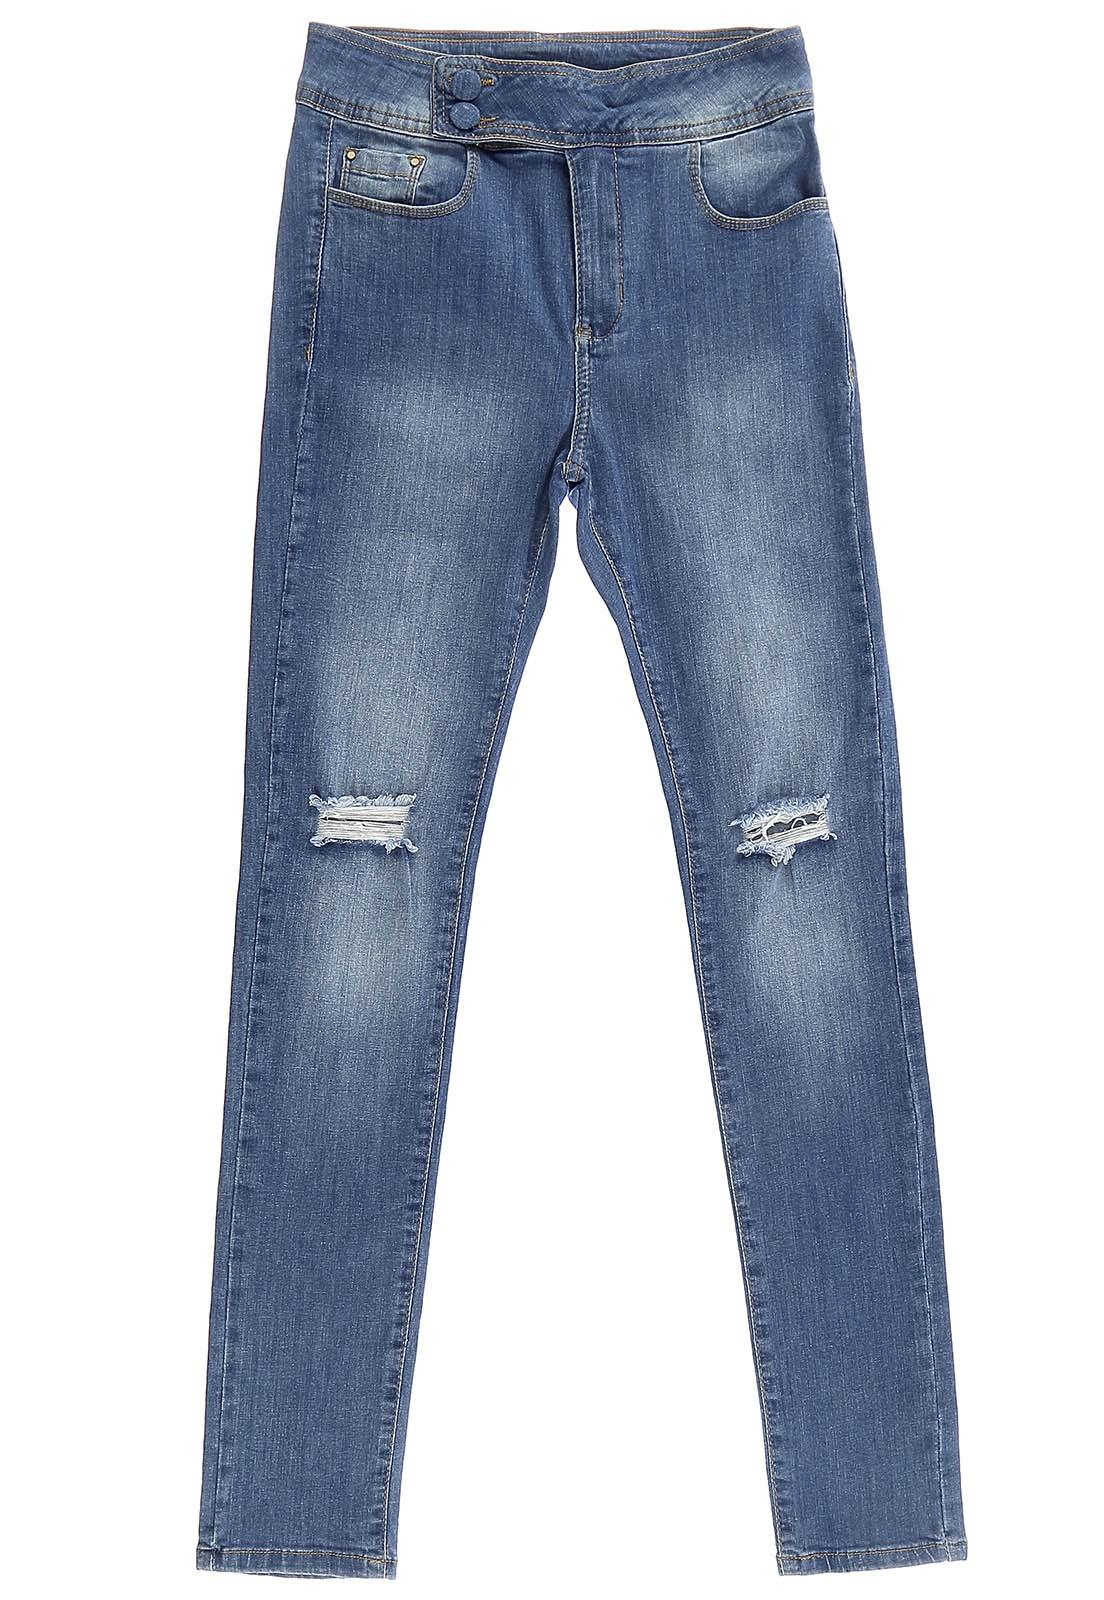 Calça Skinny Crawling Jeans Feminina